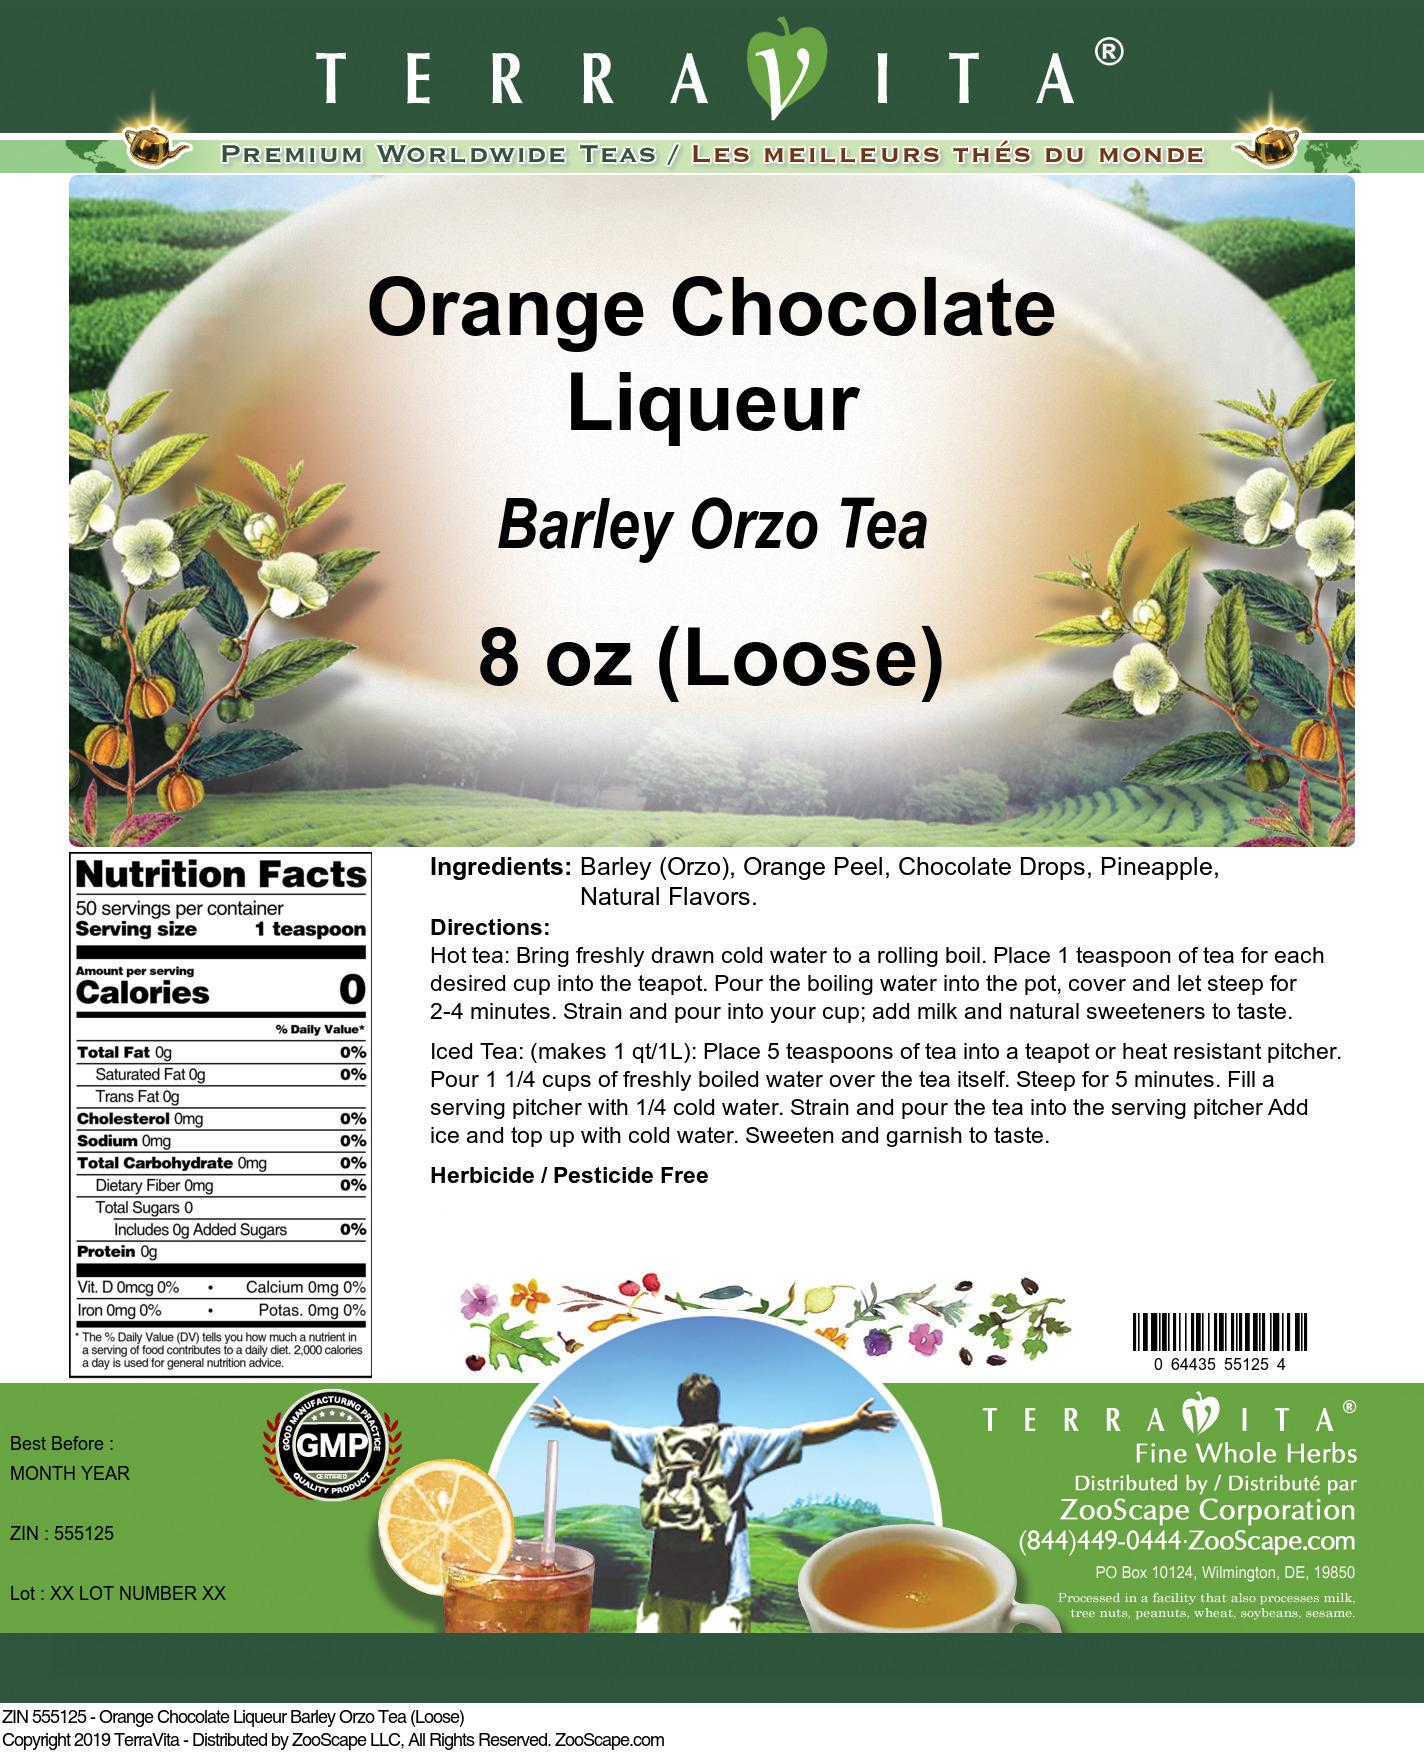 Orange Chocolate Liqueur Barley Orzo